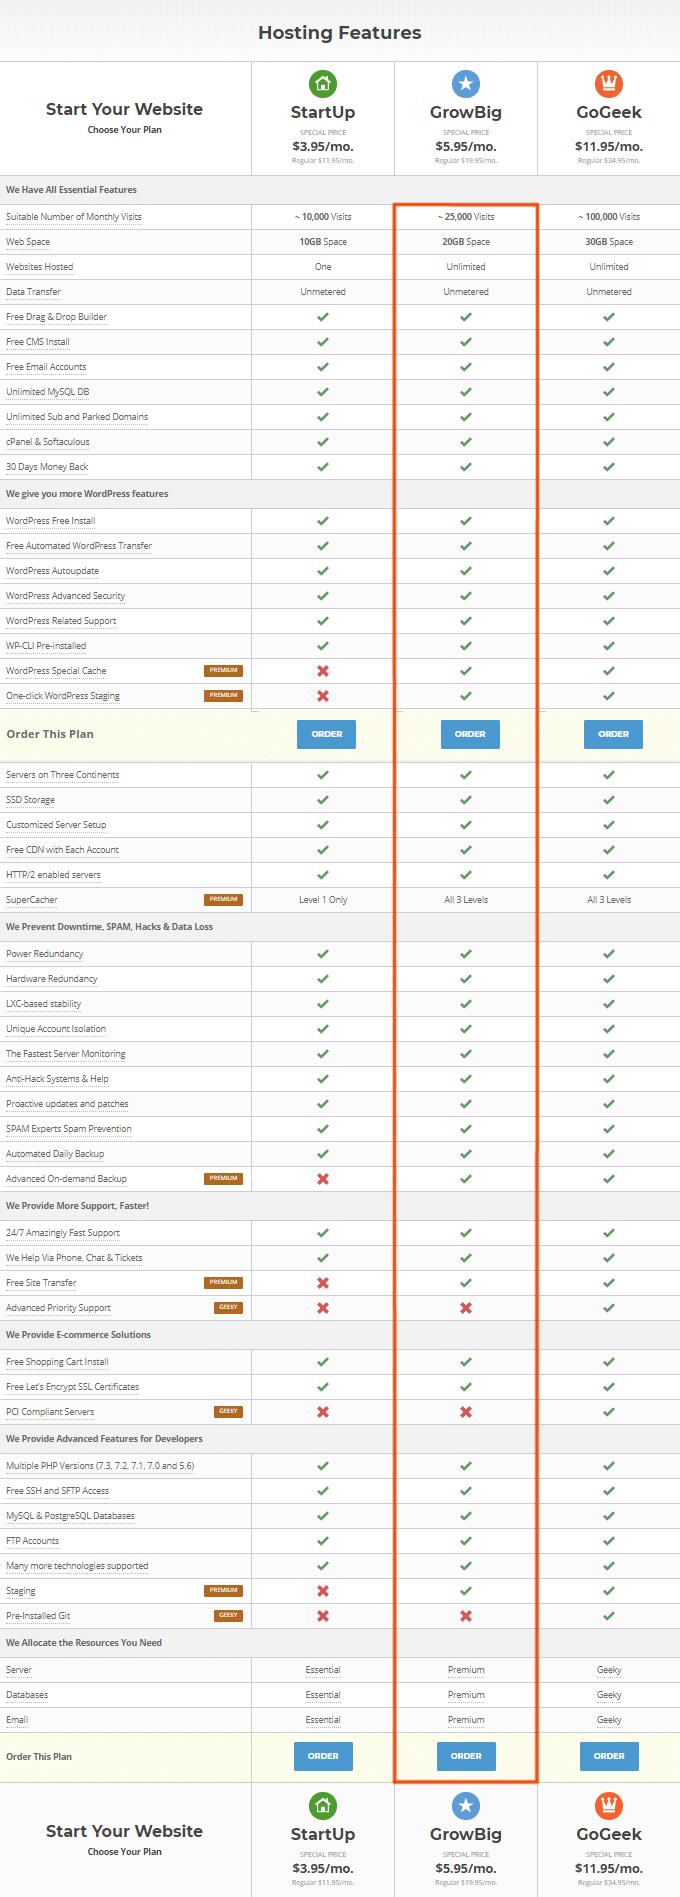 SiteGround GrowBig Plan Features